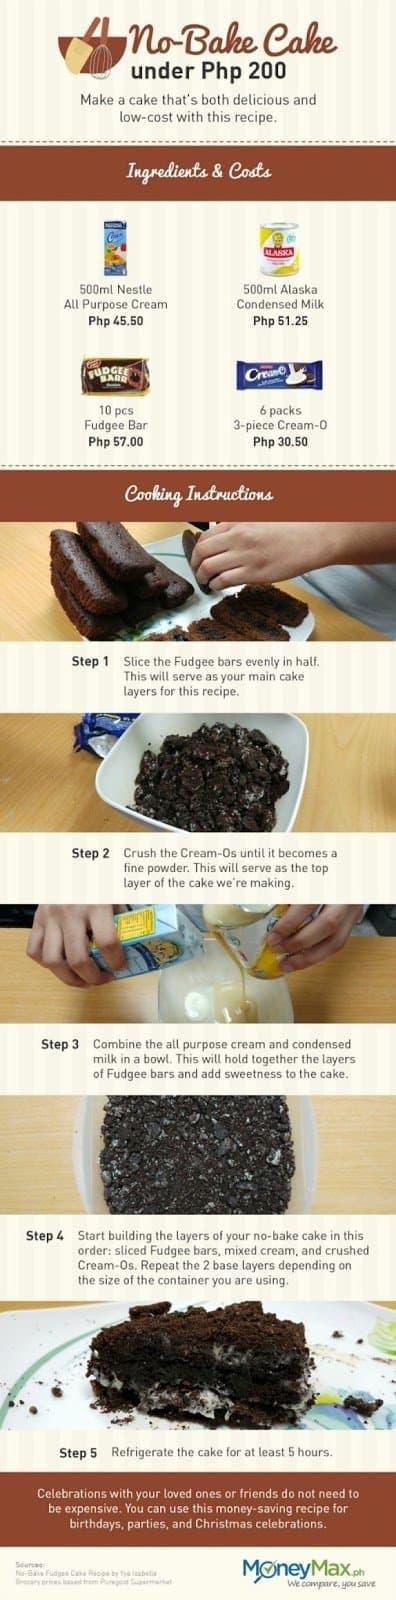 Prepare This No-Bake Fudge Cake for Valentine's Day (It's Under P200!!!)